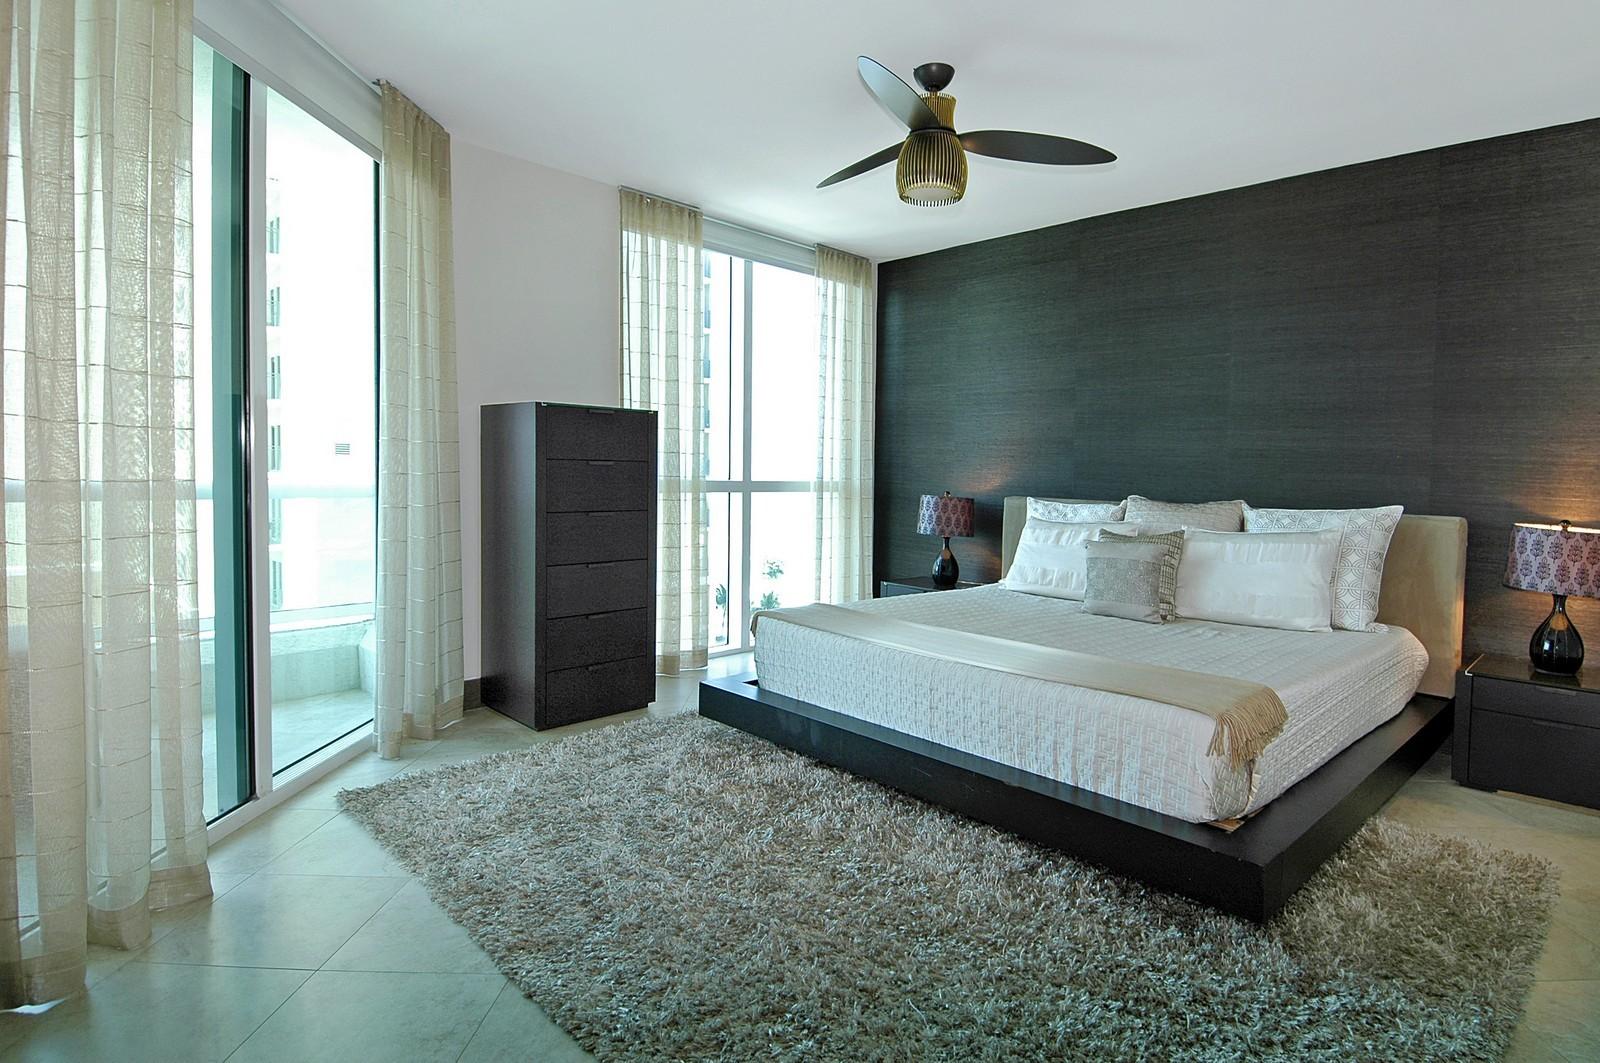 Real Estate Photography - 101 S Fort Lauderdale Beach Blvd, Unit 1506, Fort Lauderdale, FL, 33316 - Master Bedroom